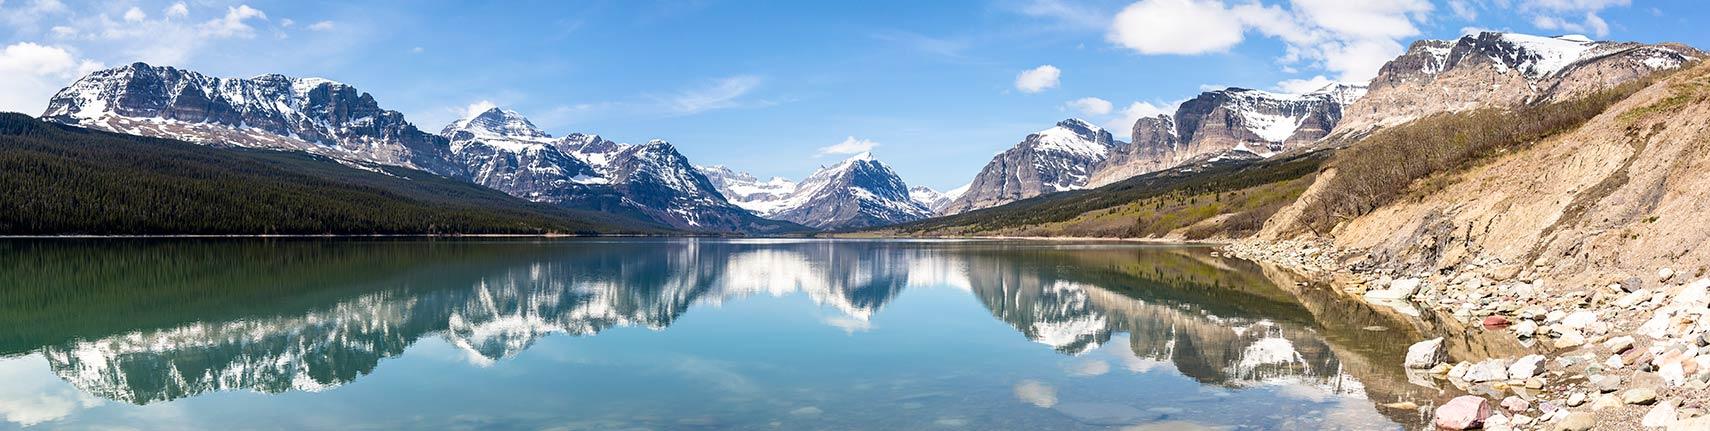 world maps index panorama of sherburne lake in the many glacier region of glacier national park montana